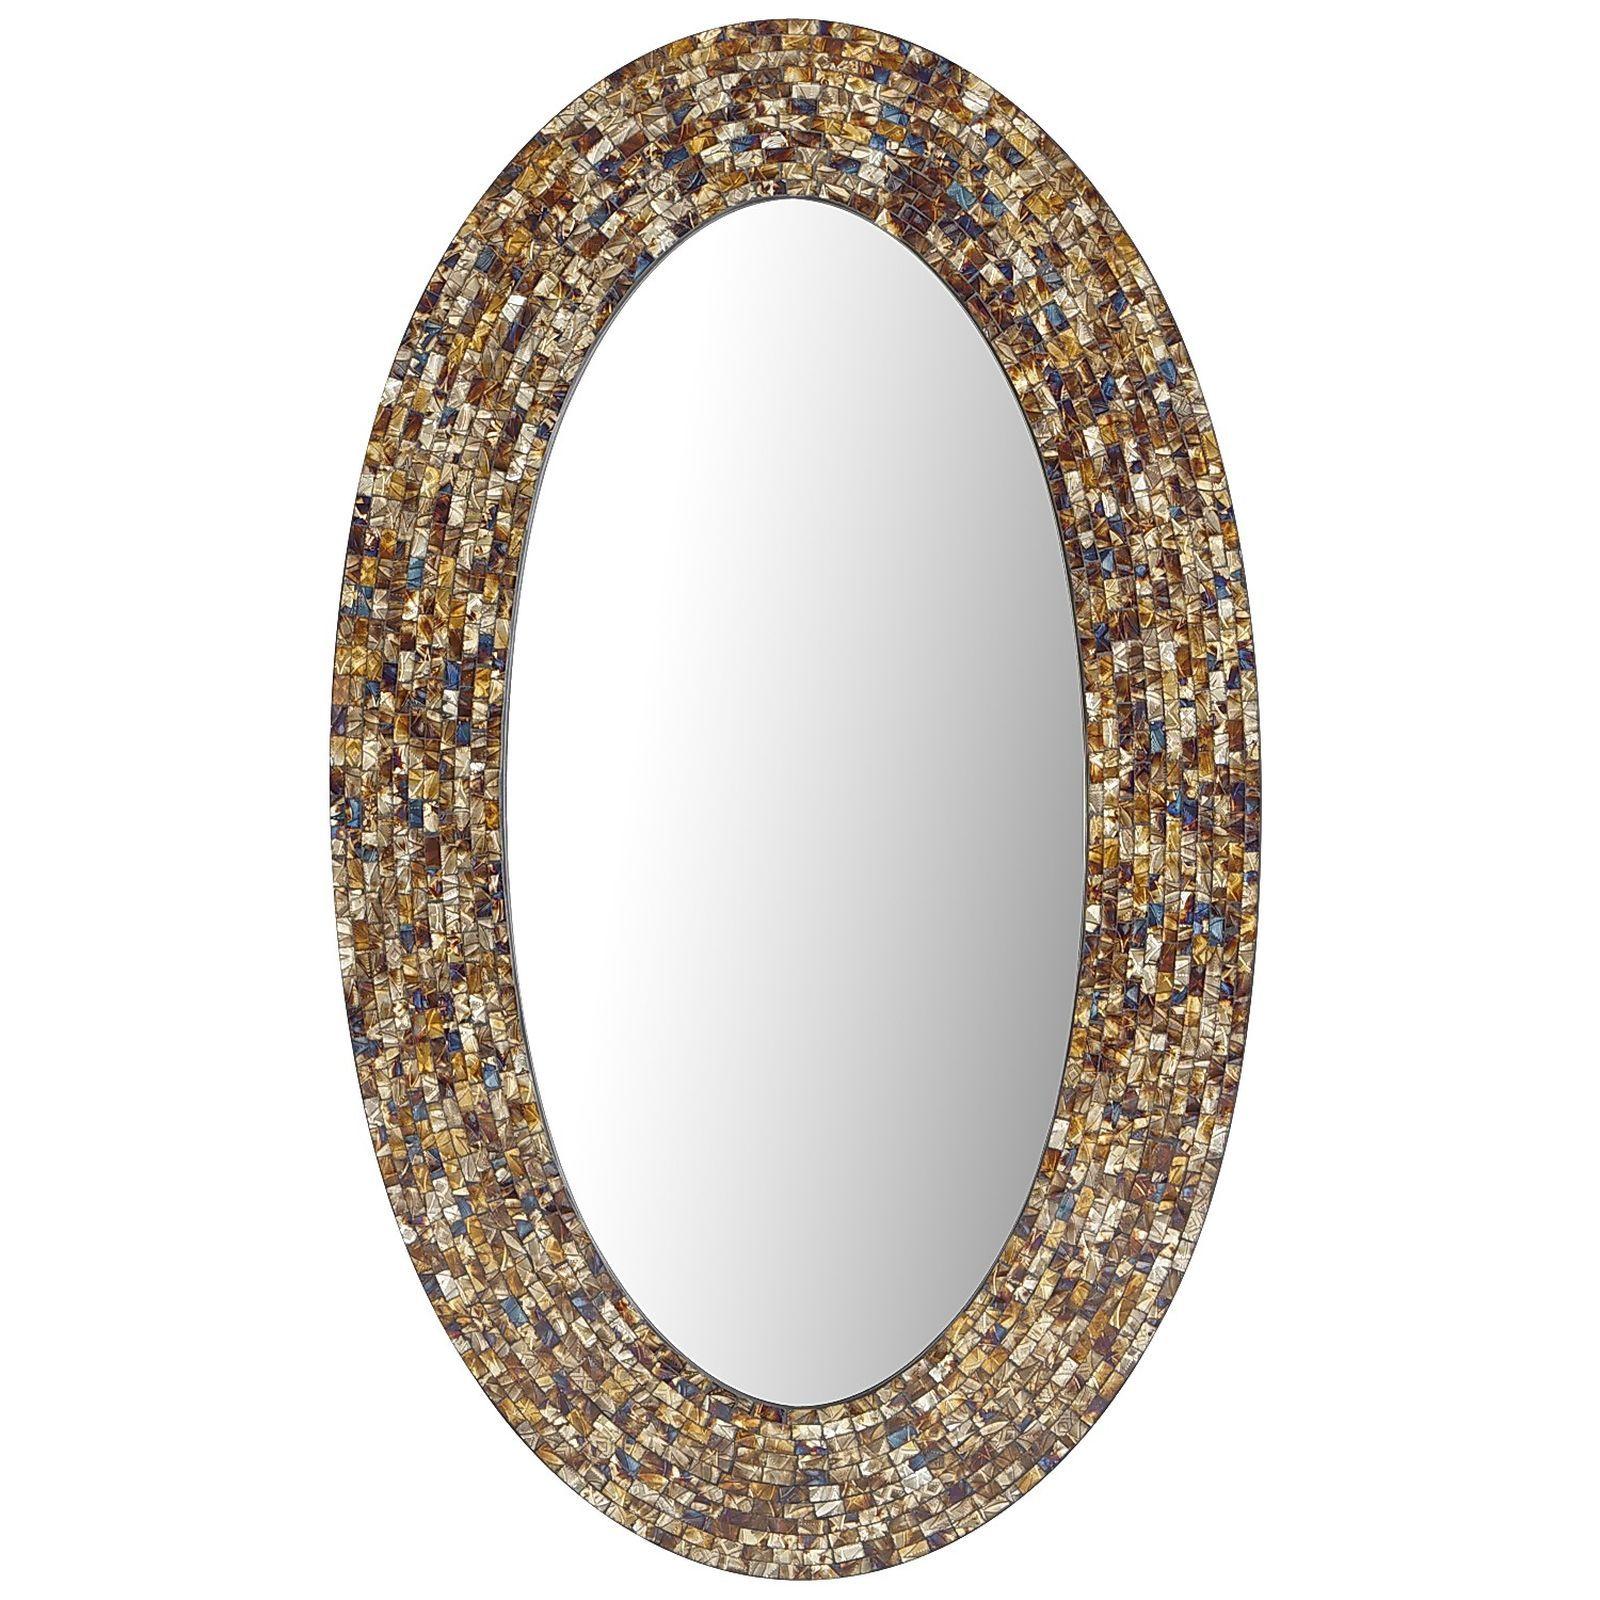 Catriana mosaic 24x40 oval mirror oval mirror diy